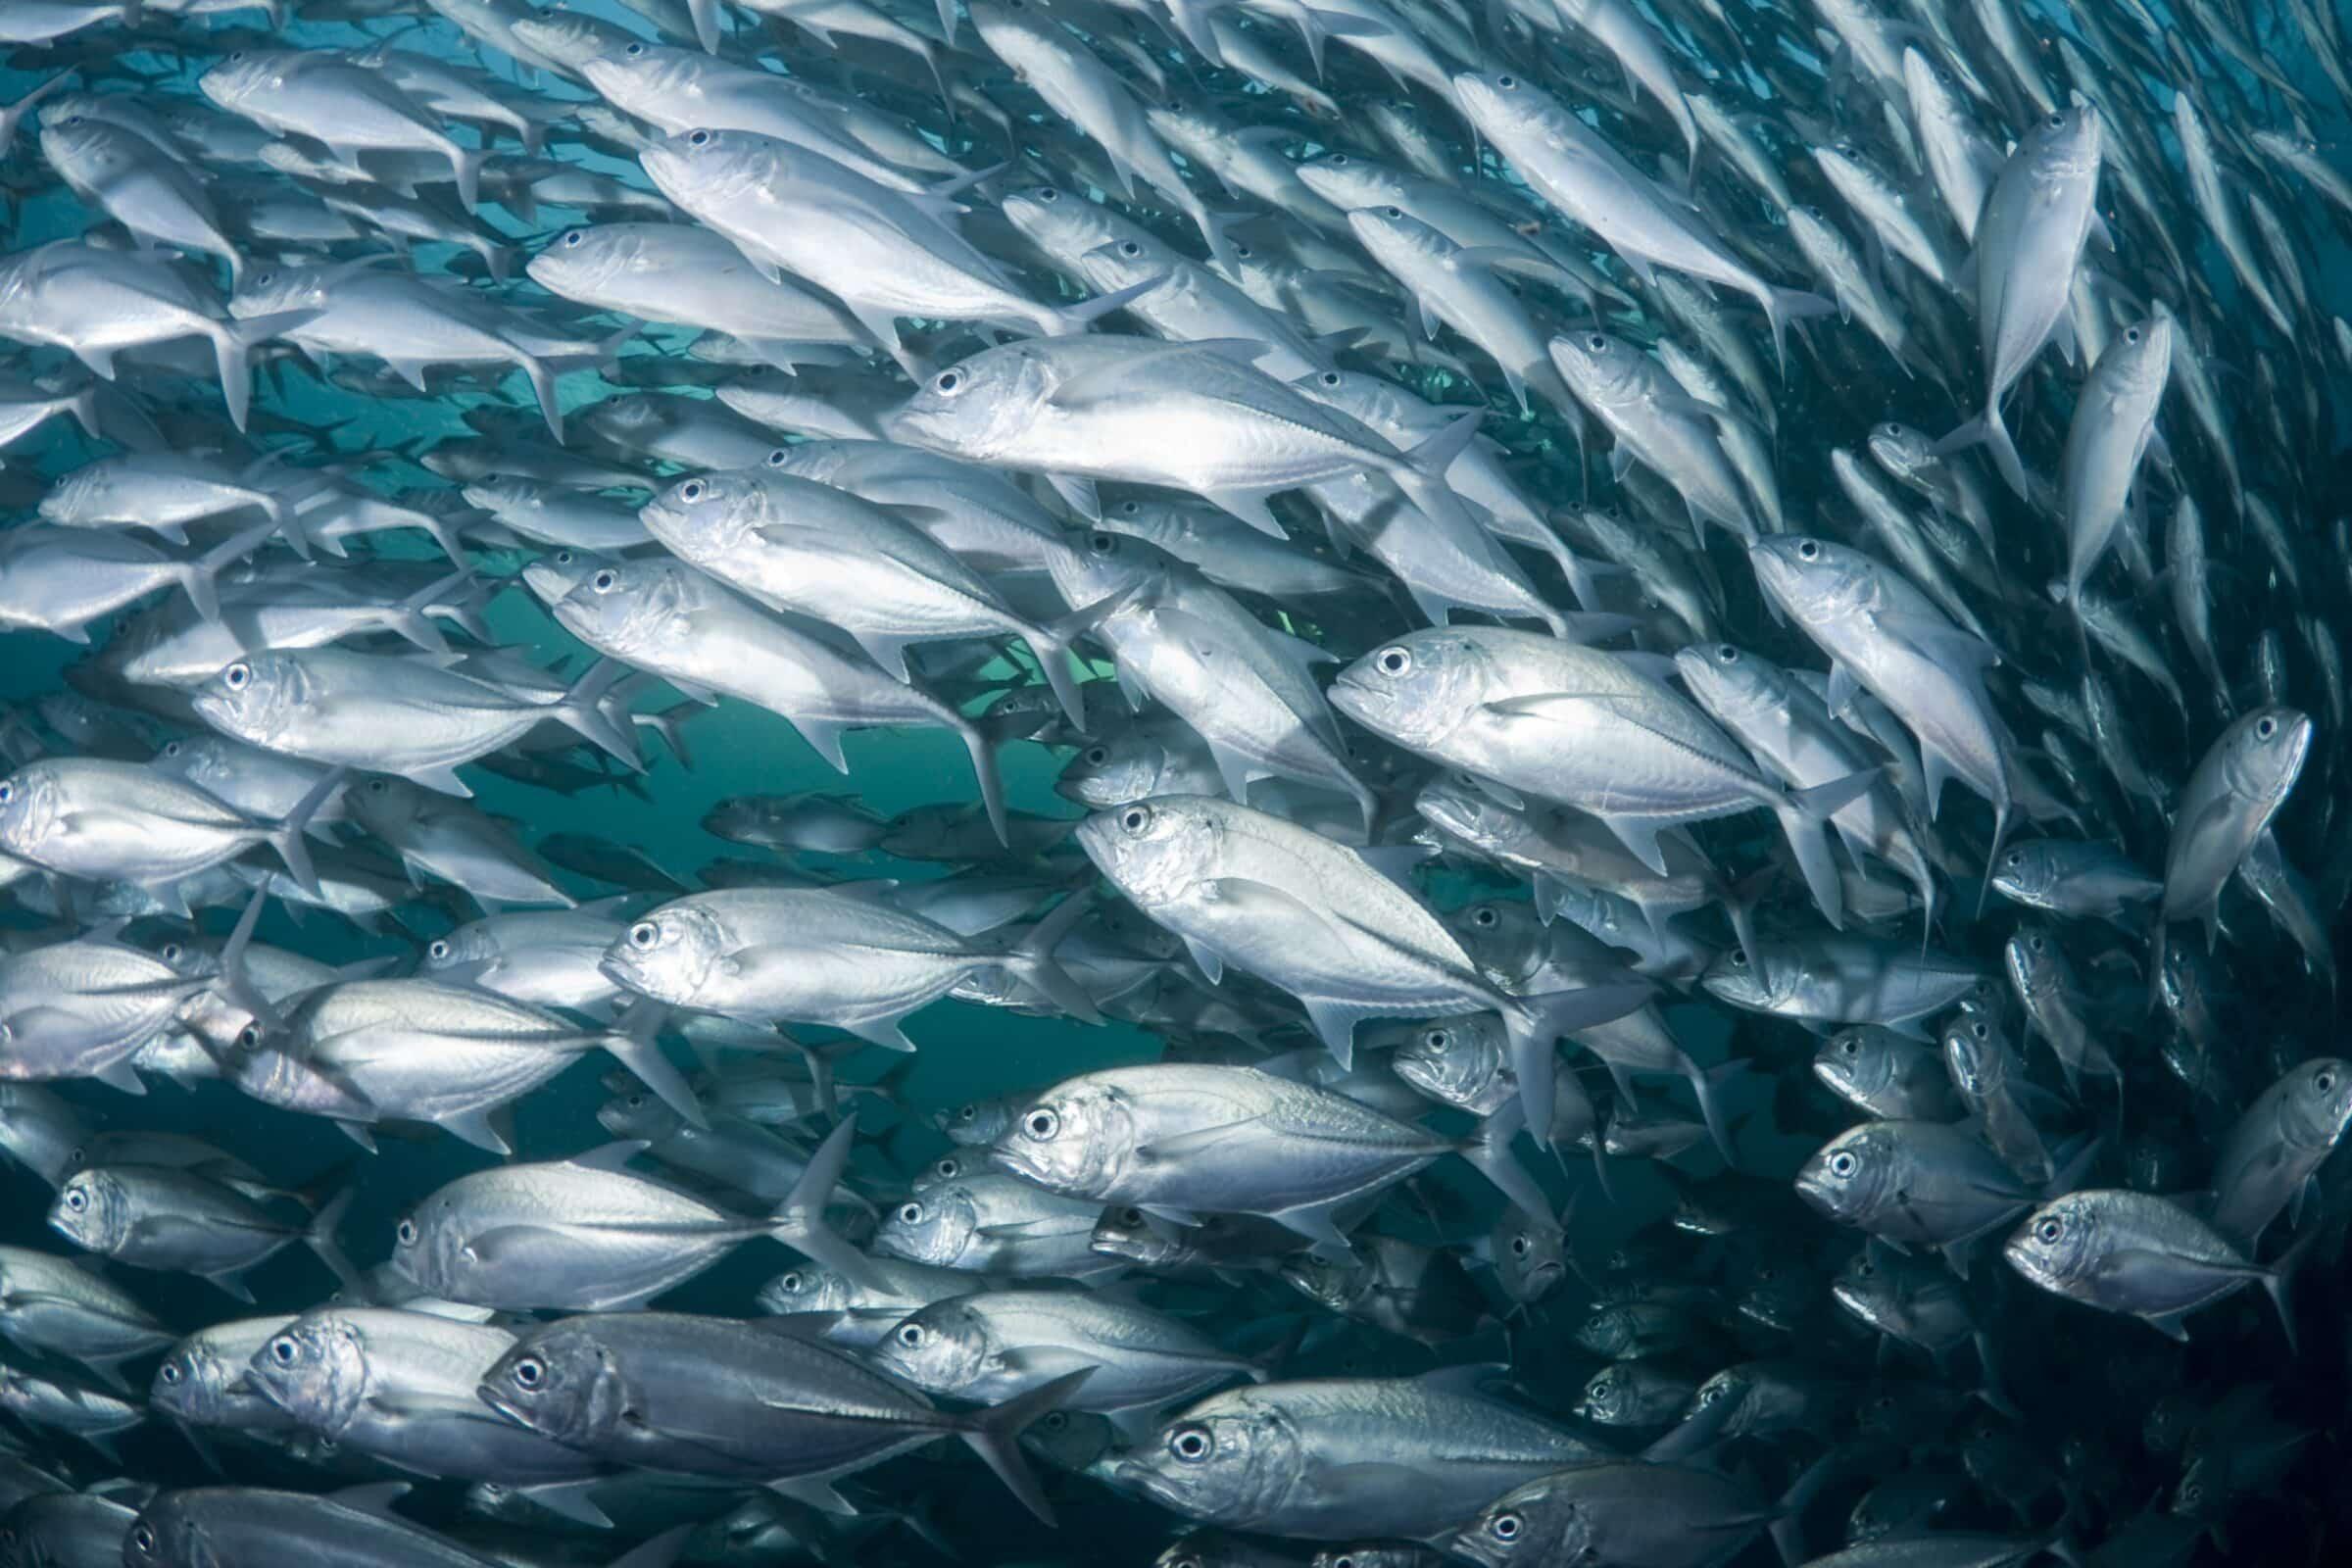 allevamento ittico